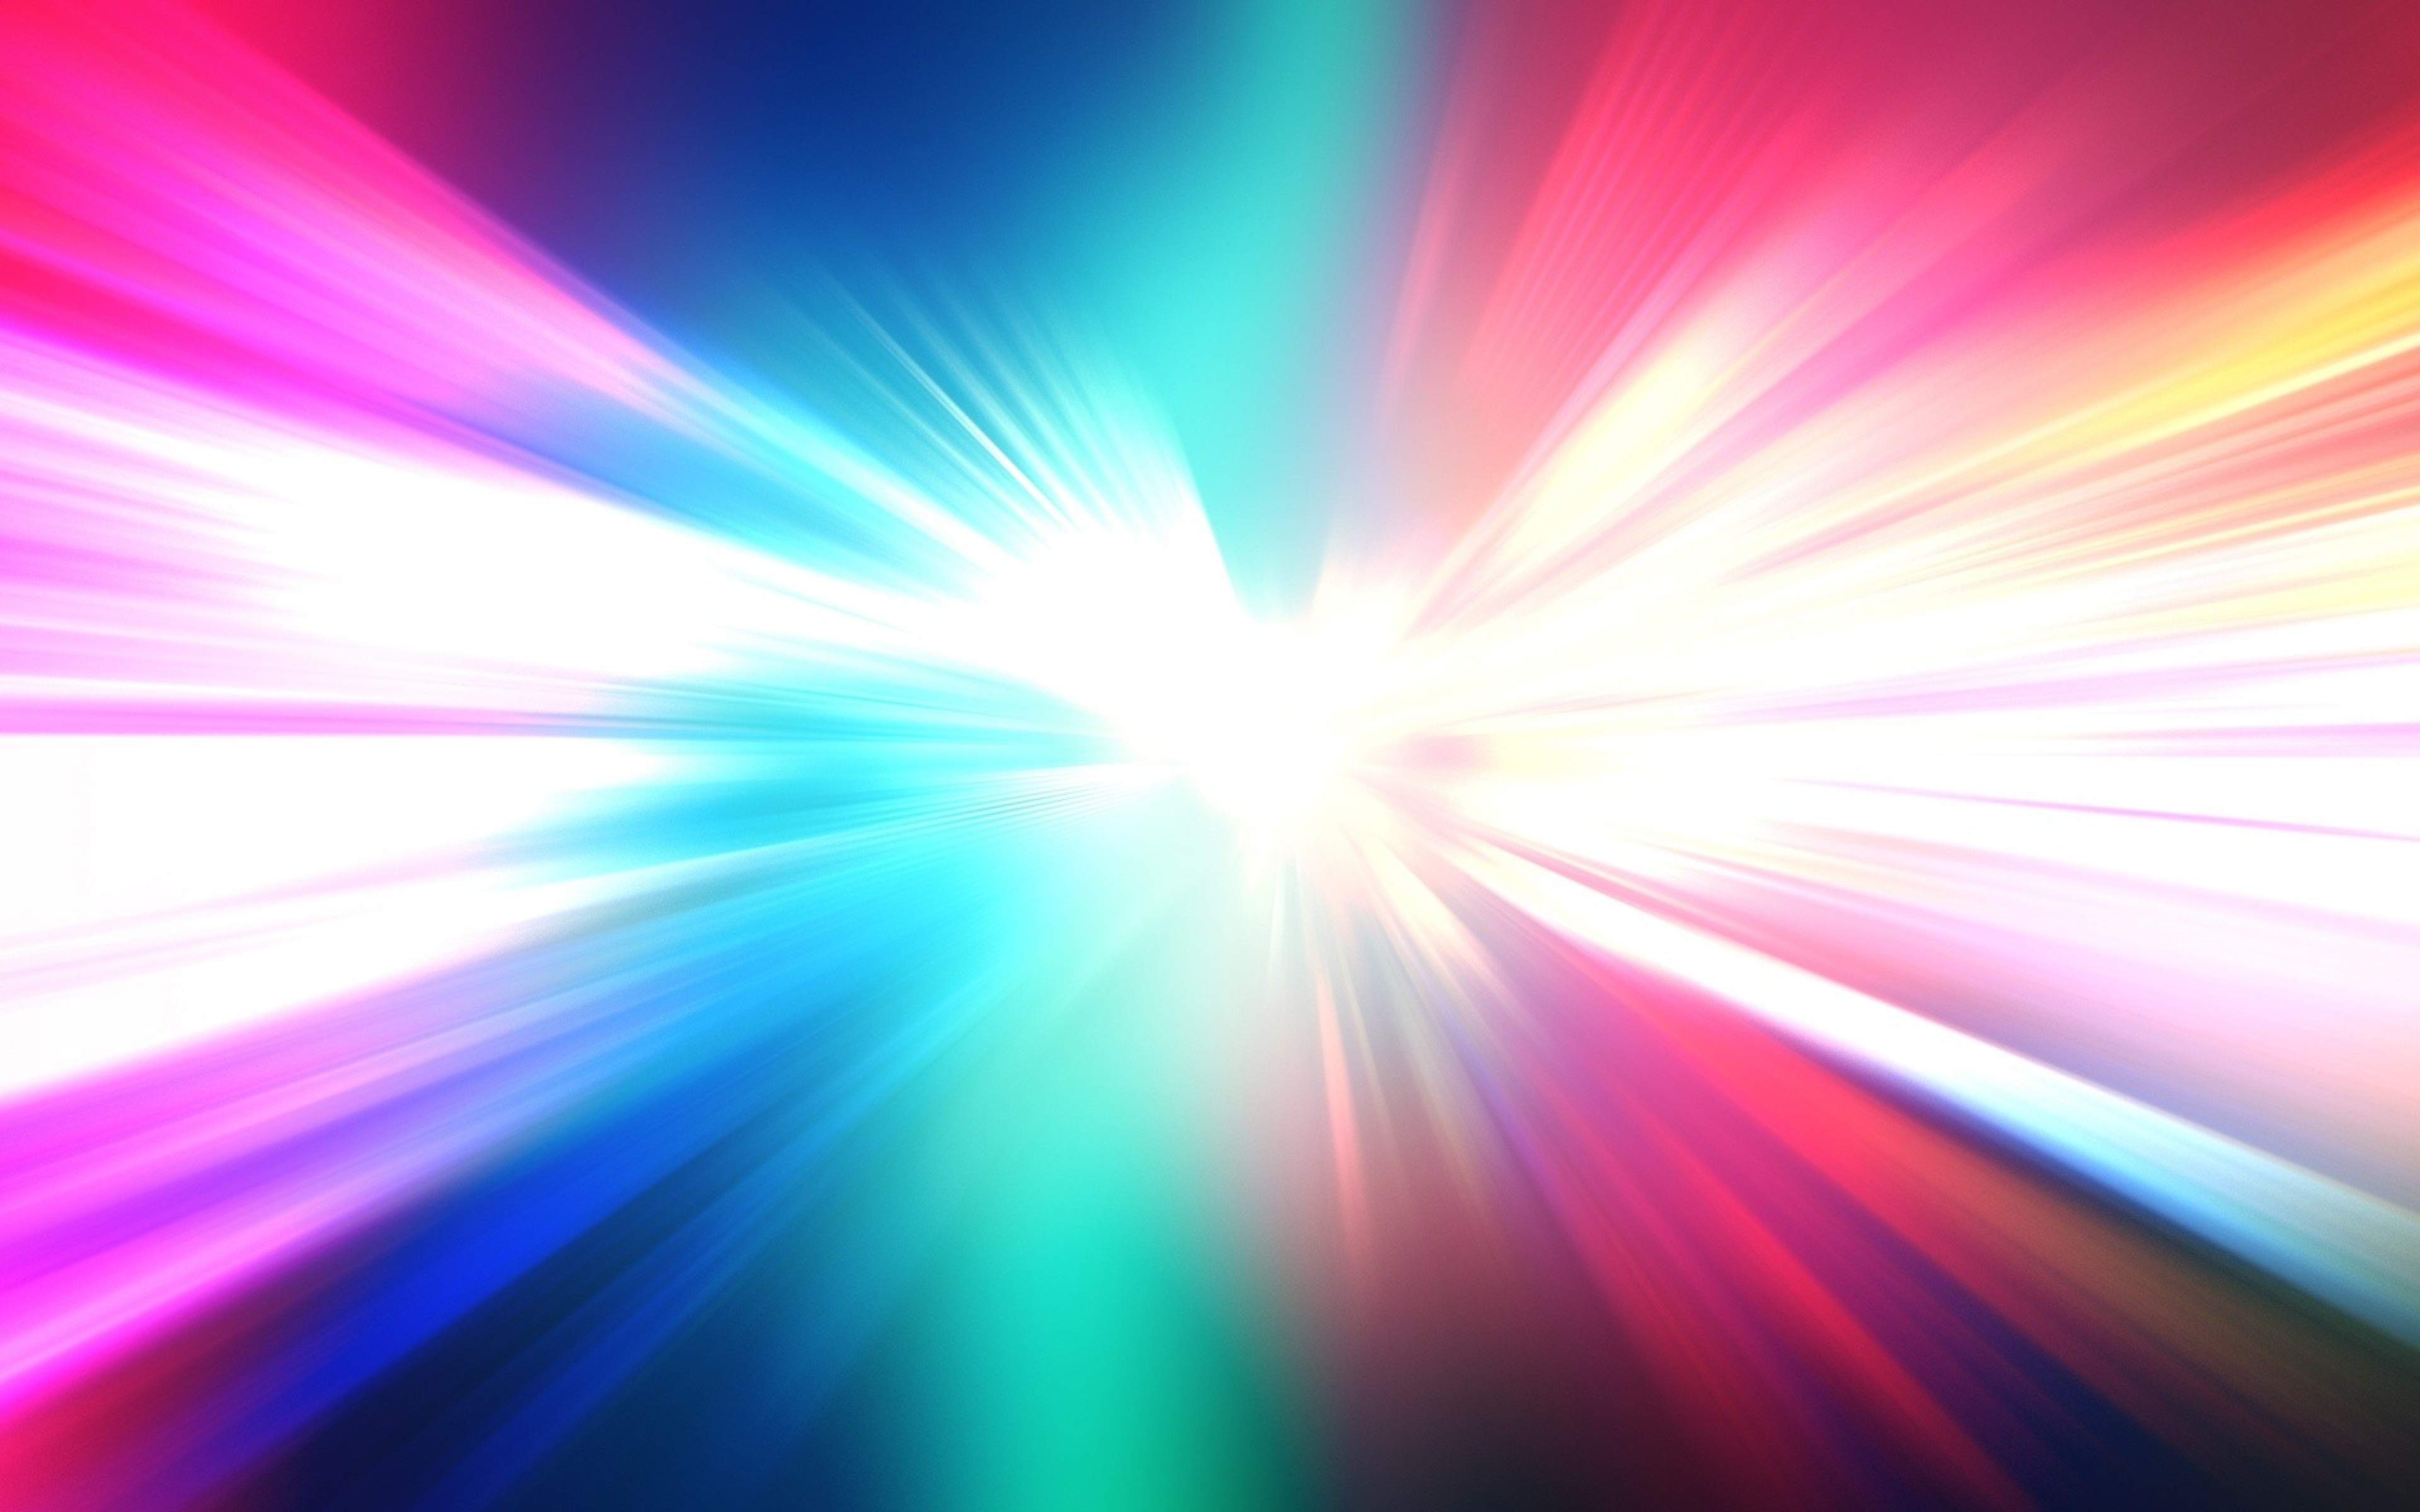 lines neon gradient art media colors background hd wallpaper 3840x2400